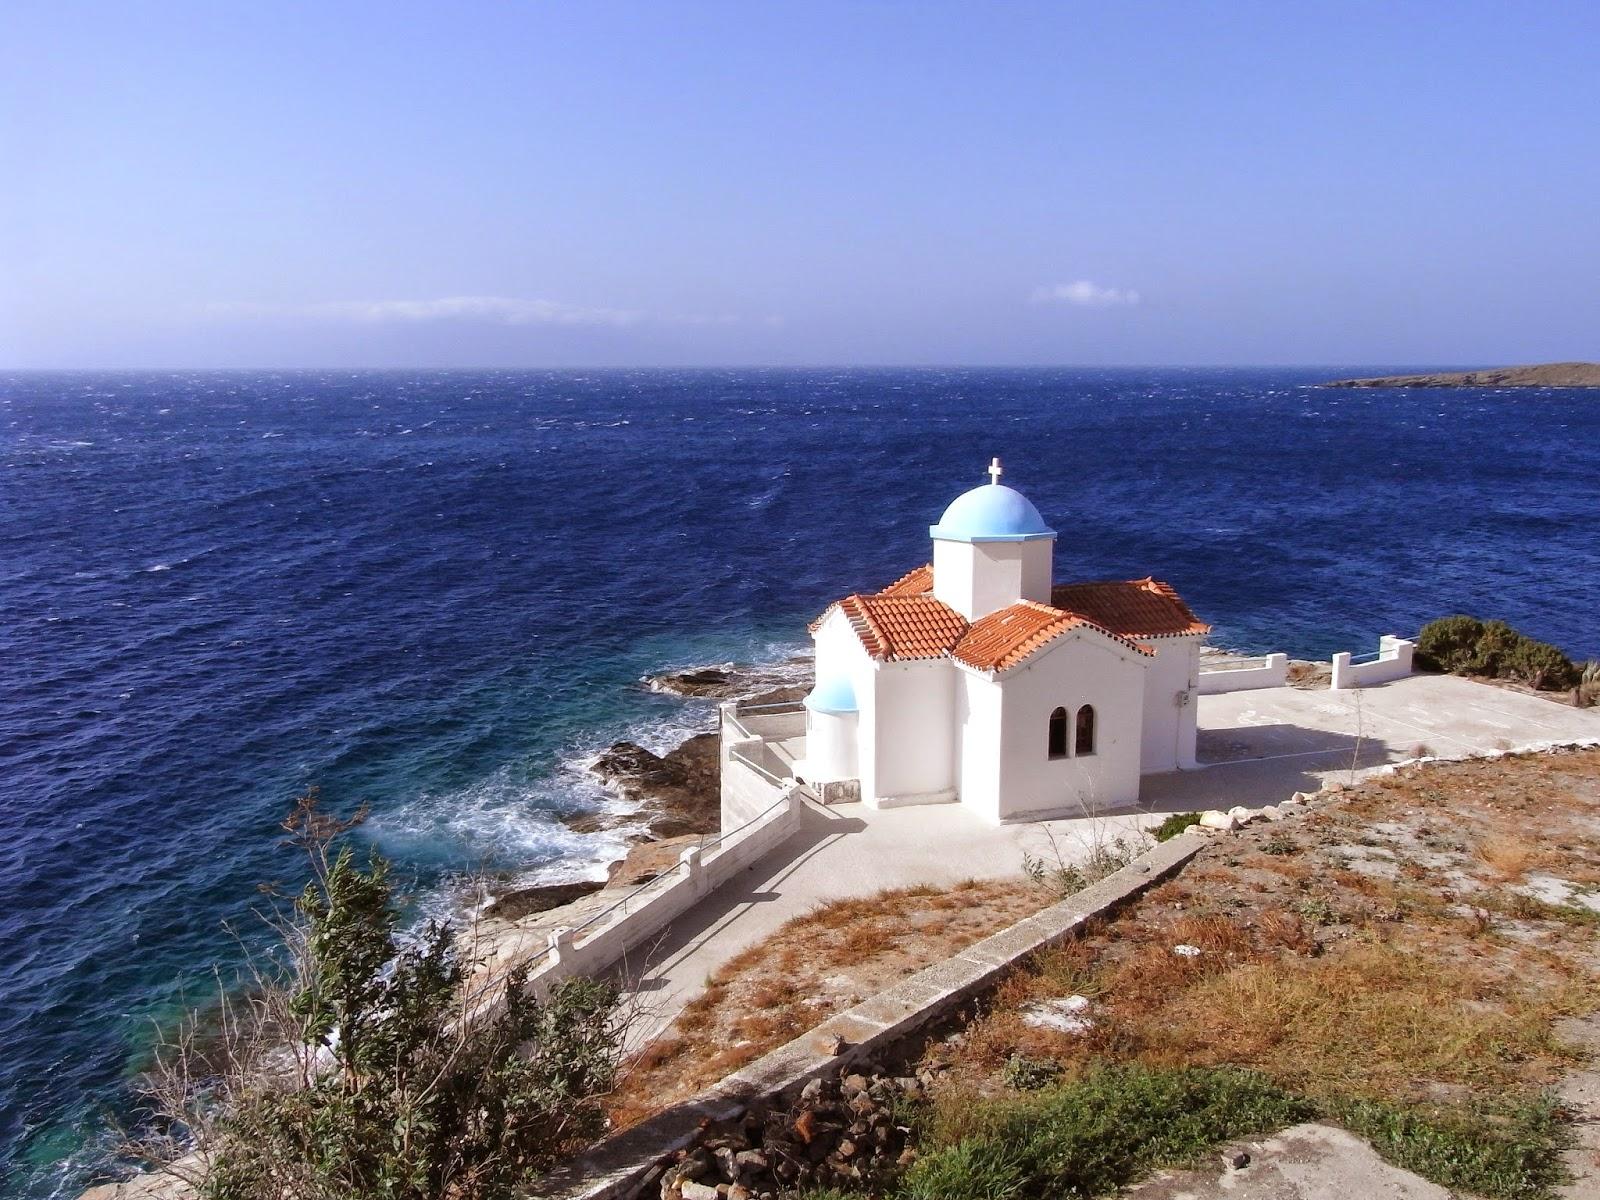 Noleggio Barche Agios Stefanos – Isola di Kithnos - Navalia | Noleggia un Sogno